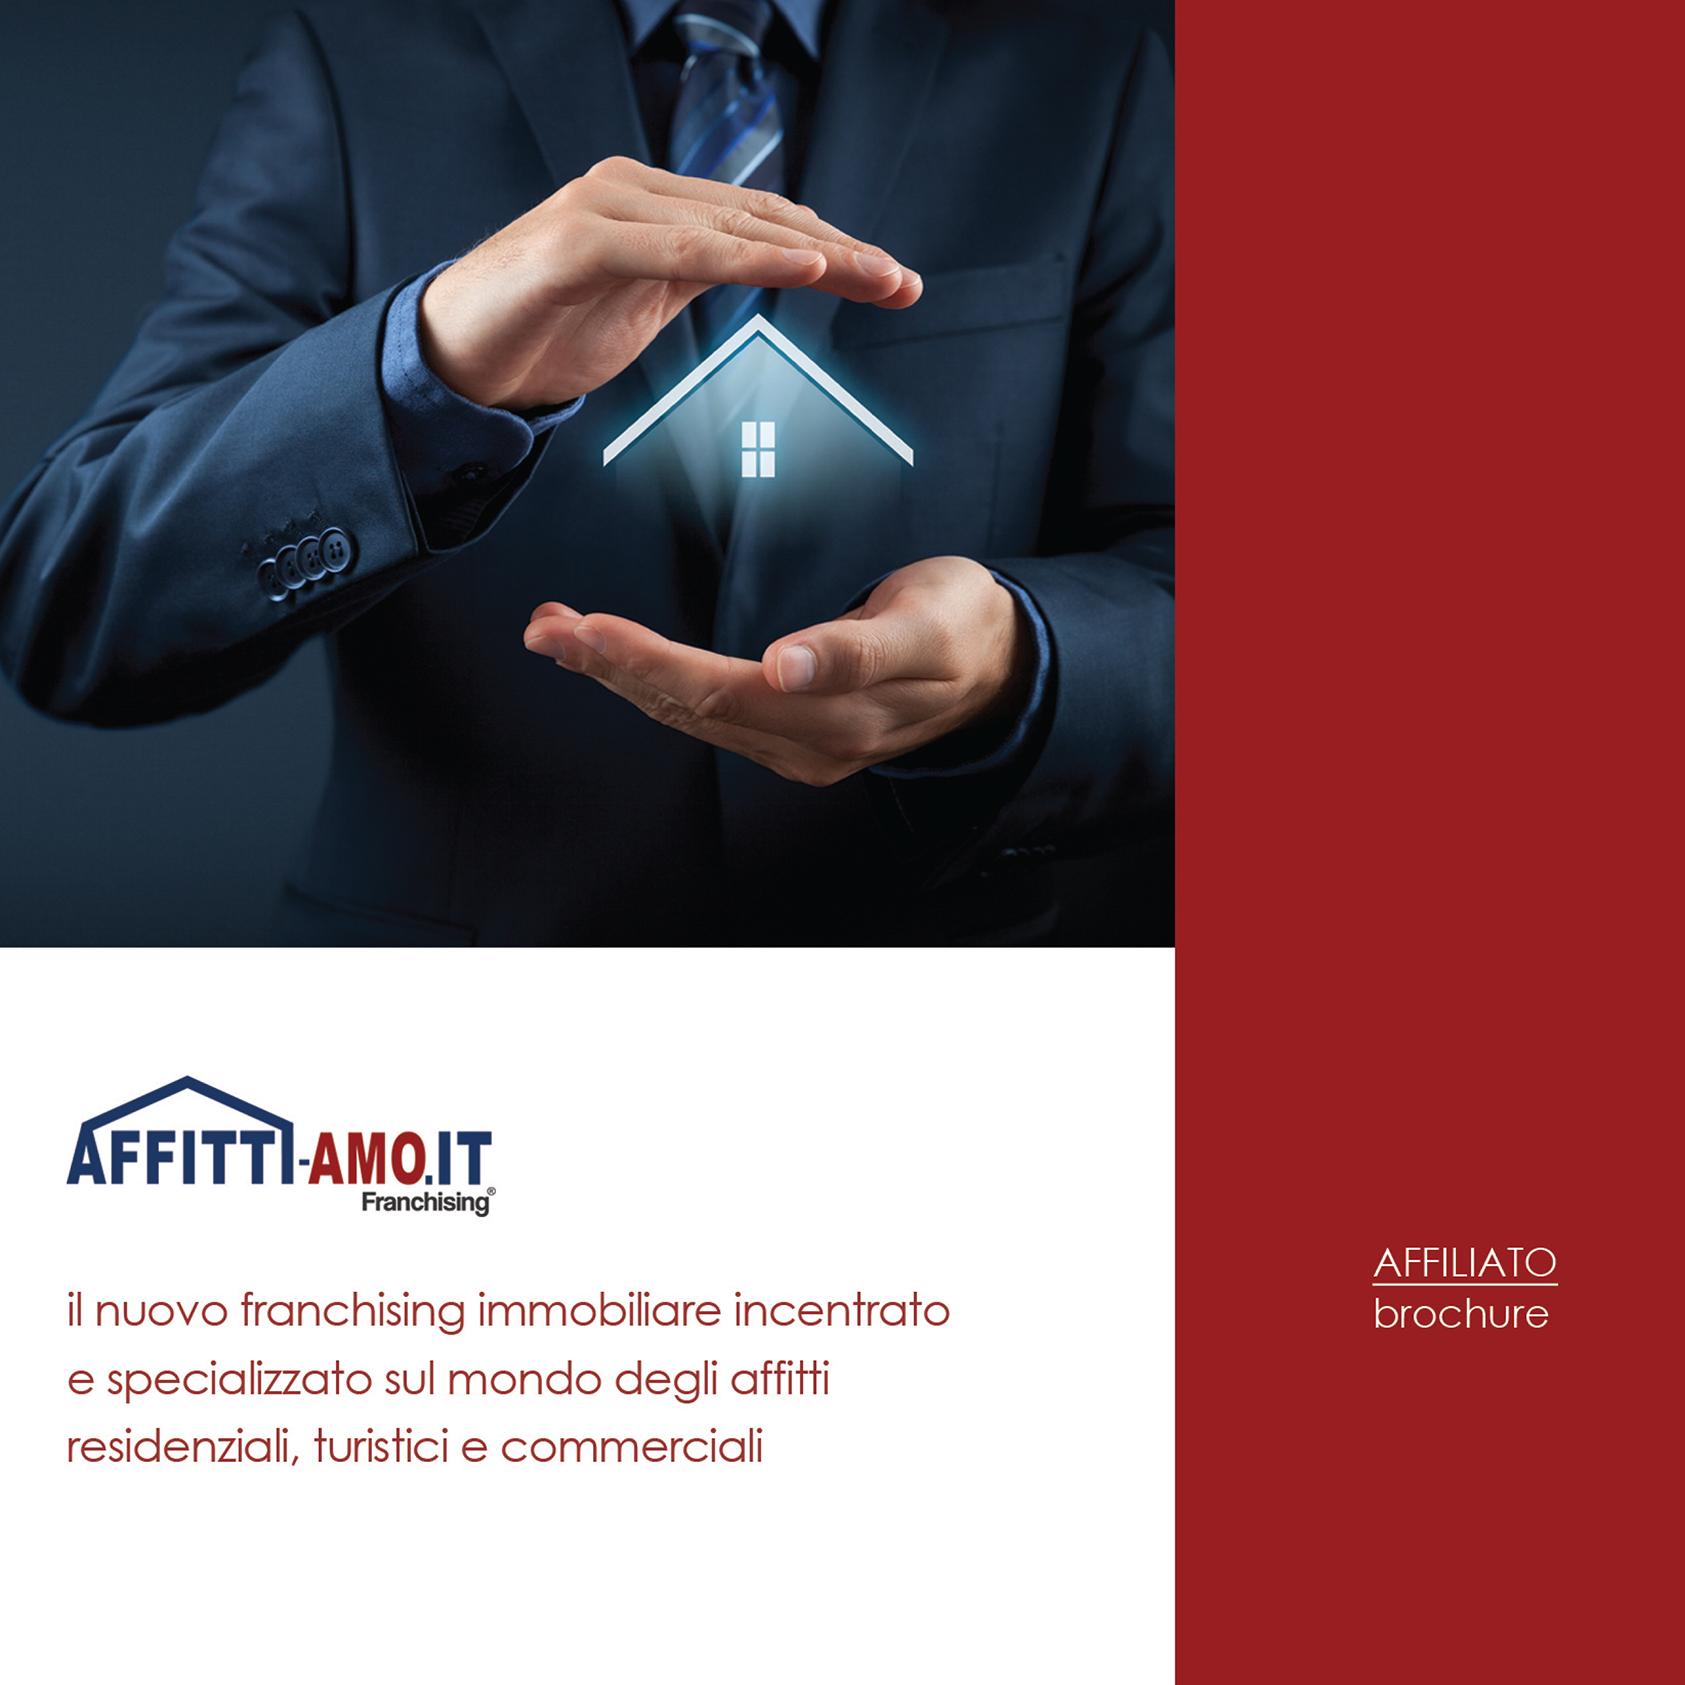 Brochure Affiliato Affitti-Amo.it